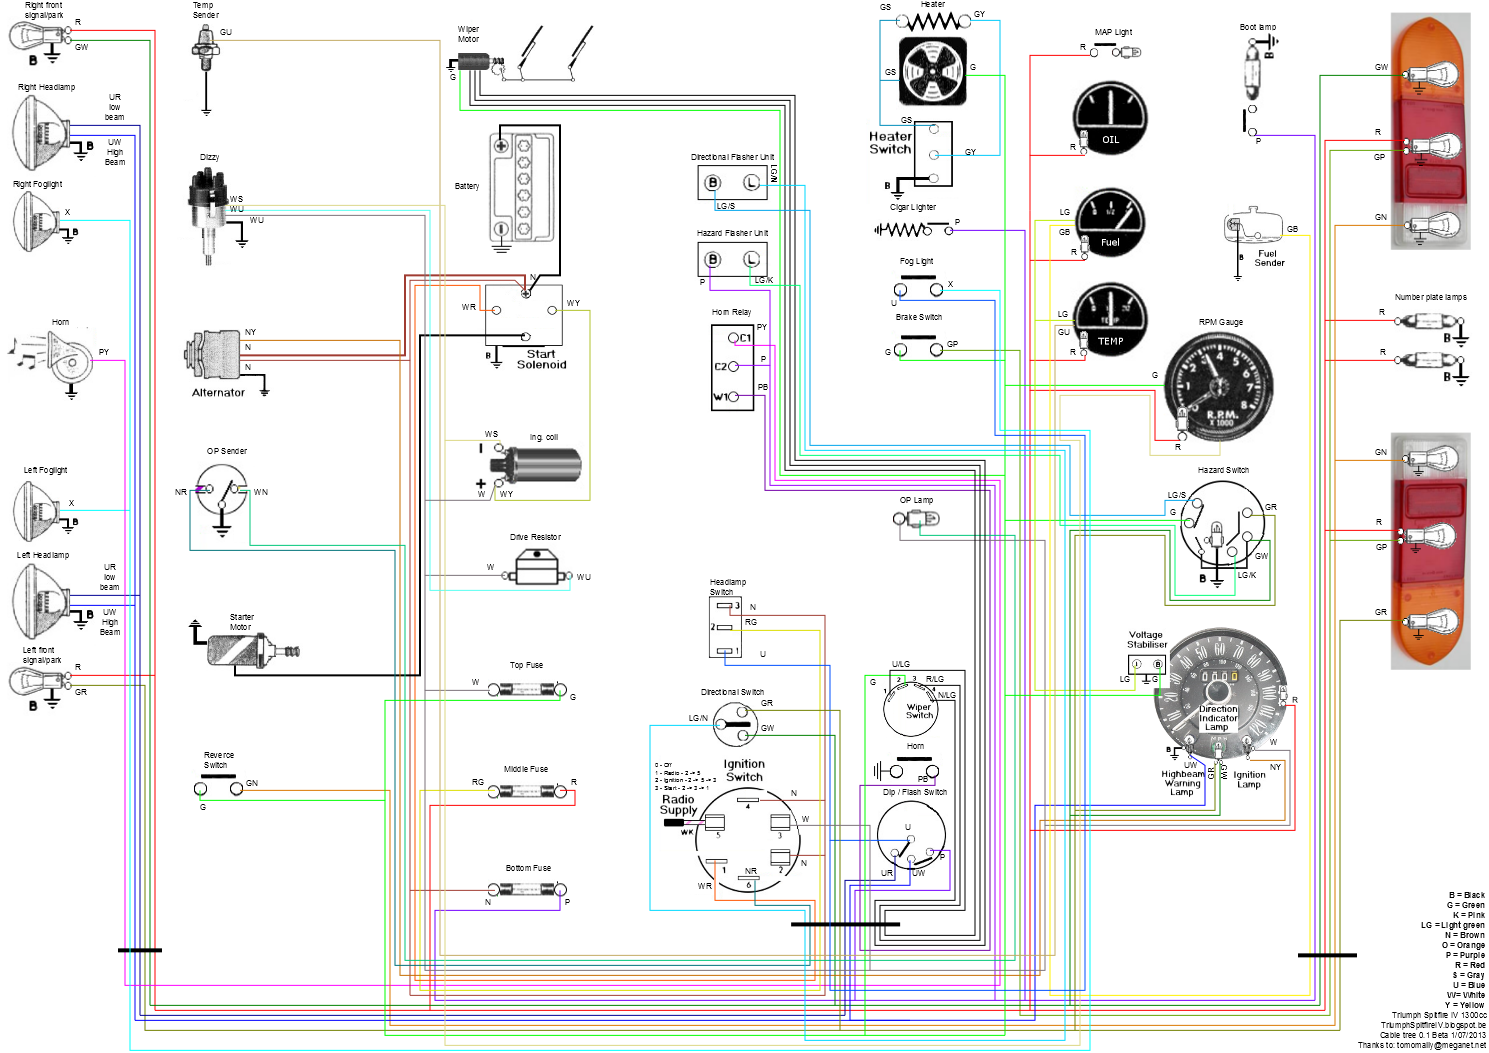 medium resolution of spitfire 1500 wire harness diagram wiring diagram expert 1980 spitfire wiring diagram wiring diagram paper spitfire